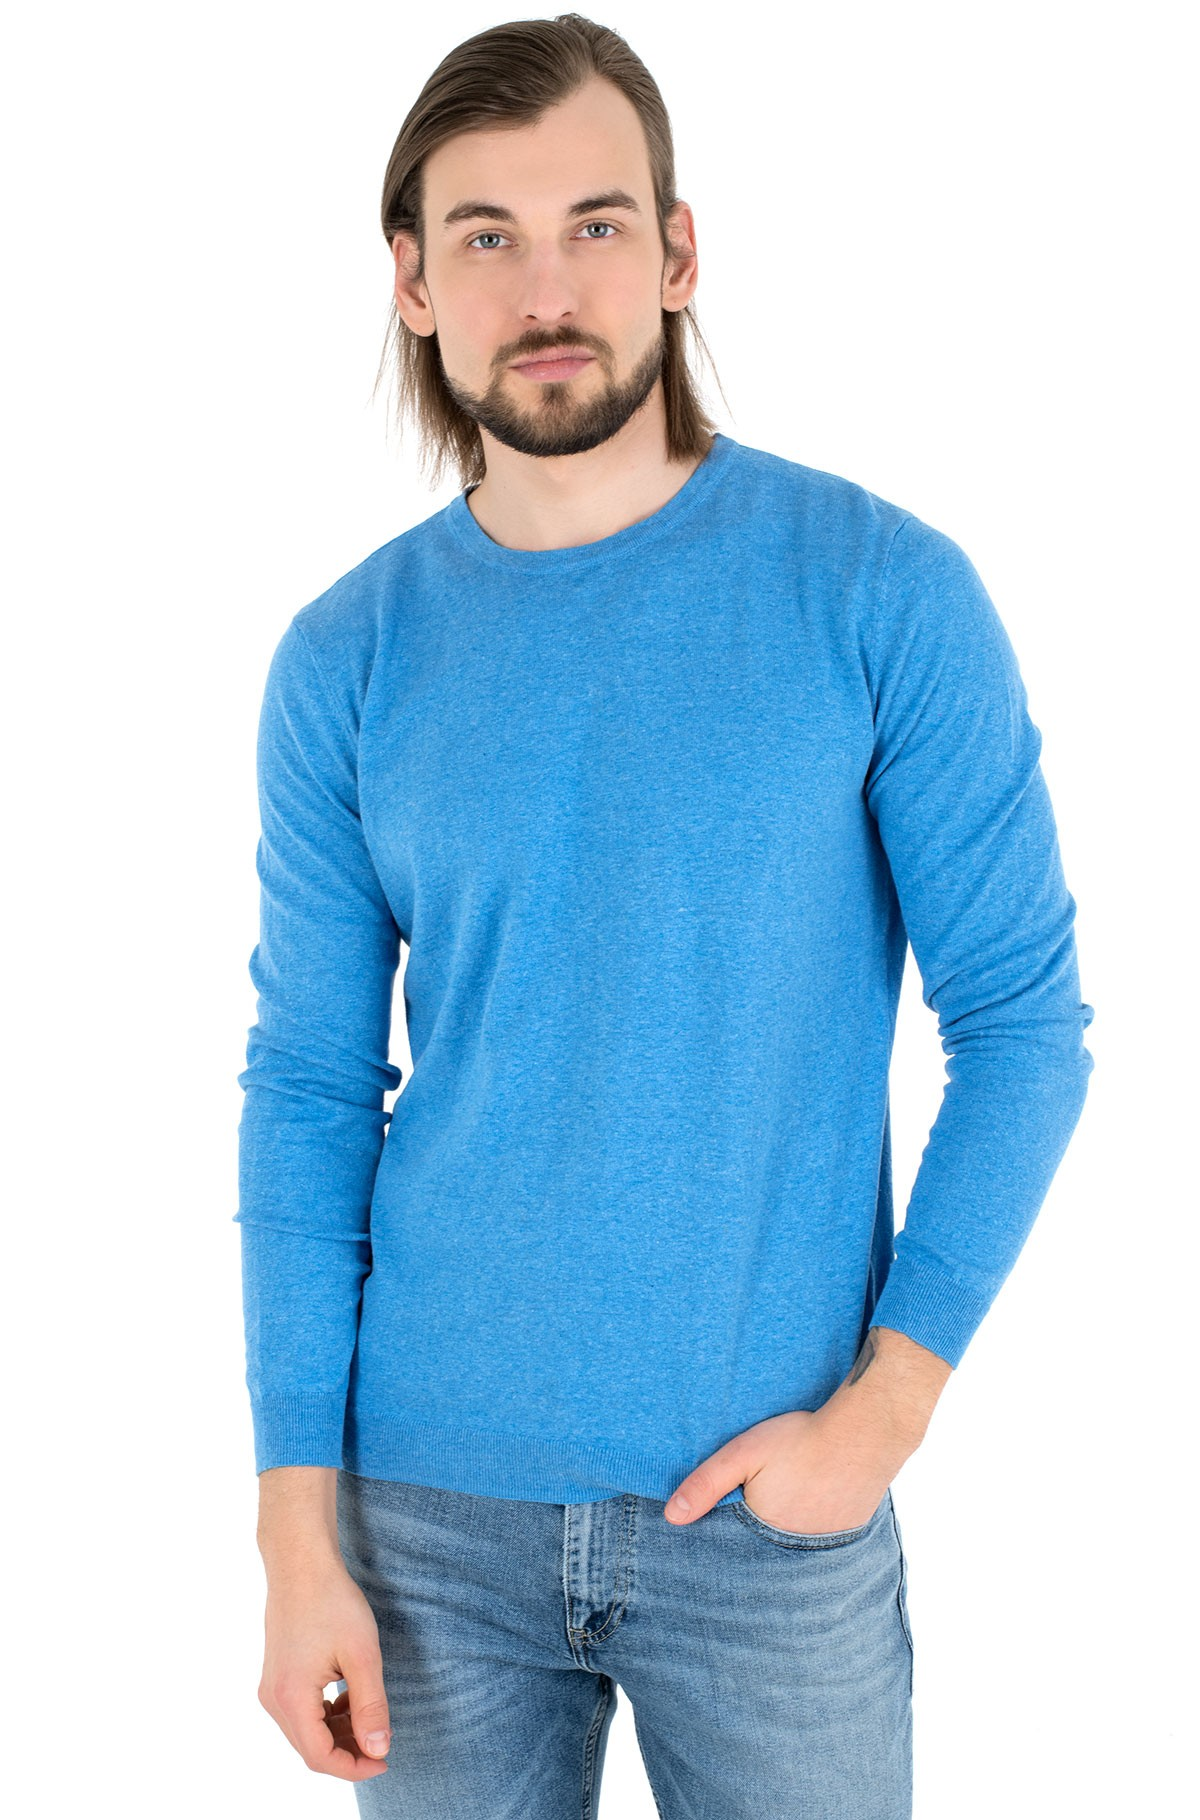 Sweater 1024660-full-1